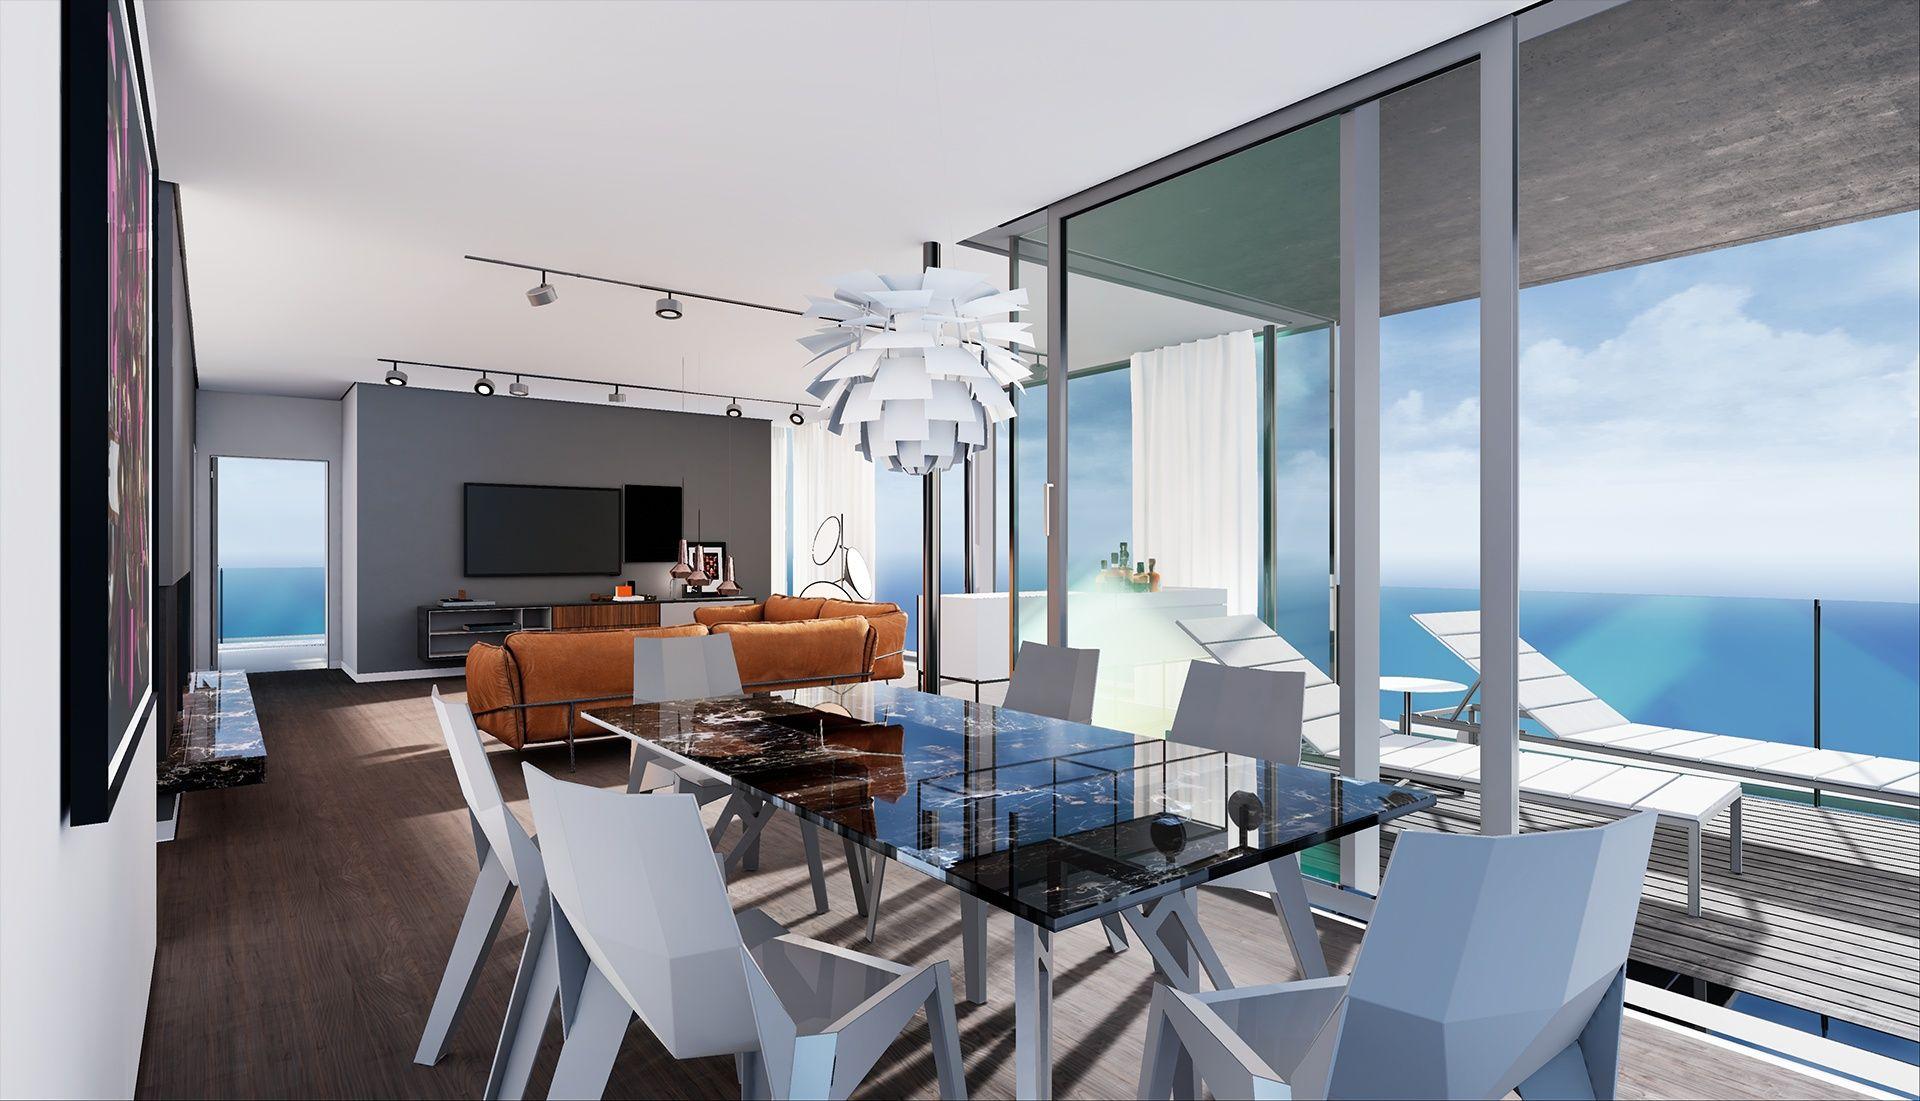 ArchViz For Virtual Reality U2013 Dining Room Penthouse Munich |  Architekturvisualisierung Für Virtual Reality U2013 Esszimmer